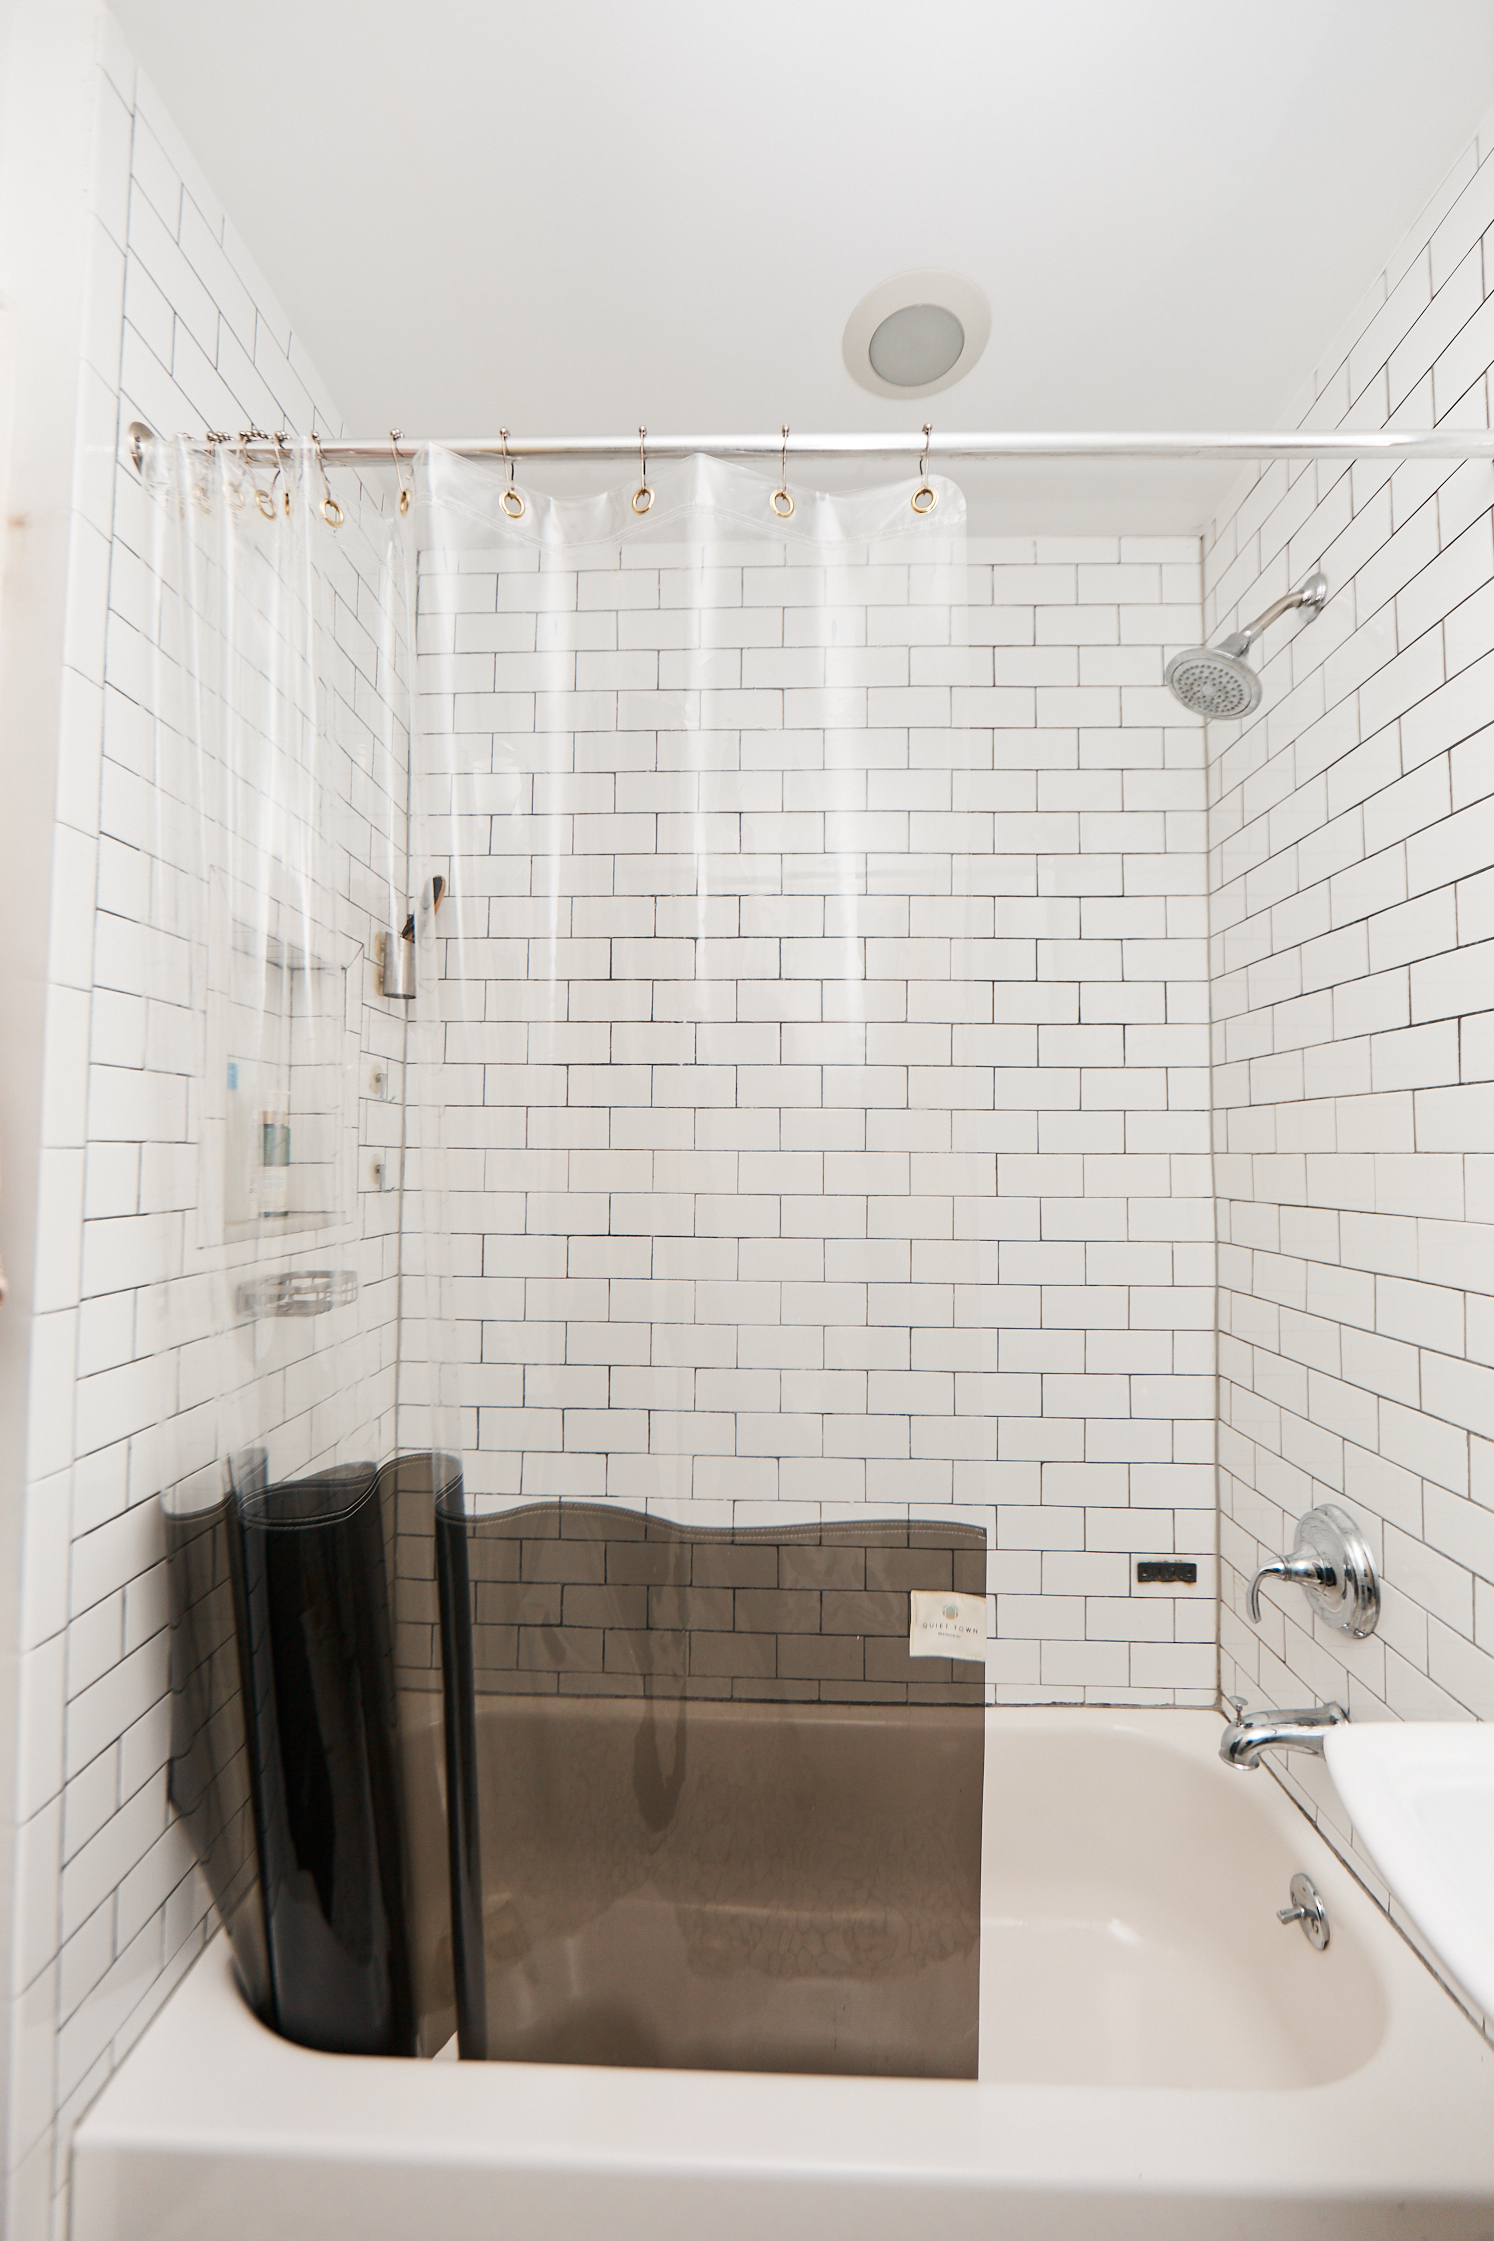 small bathroom look so much bigger